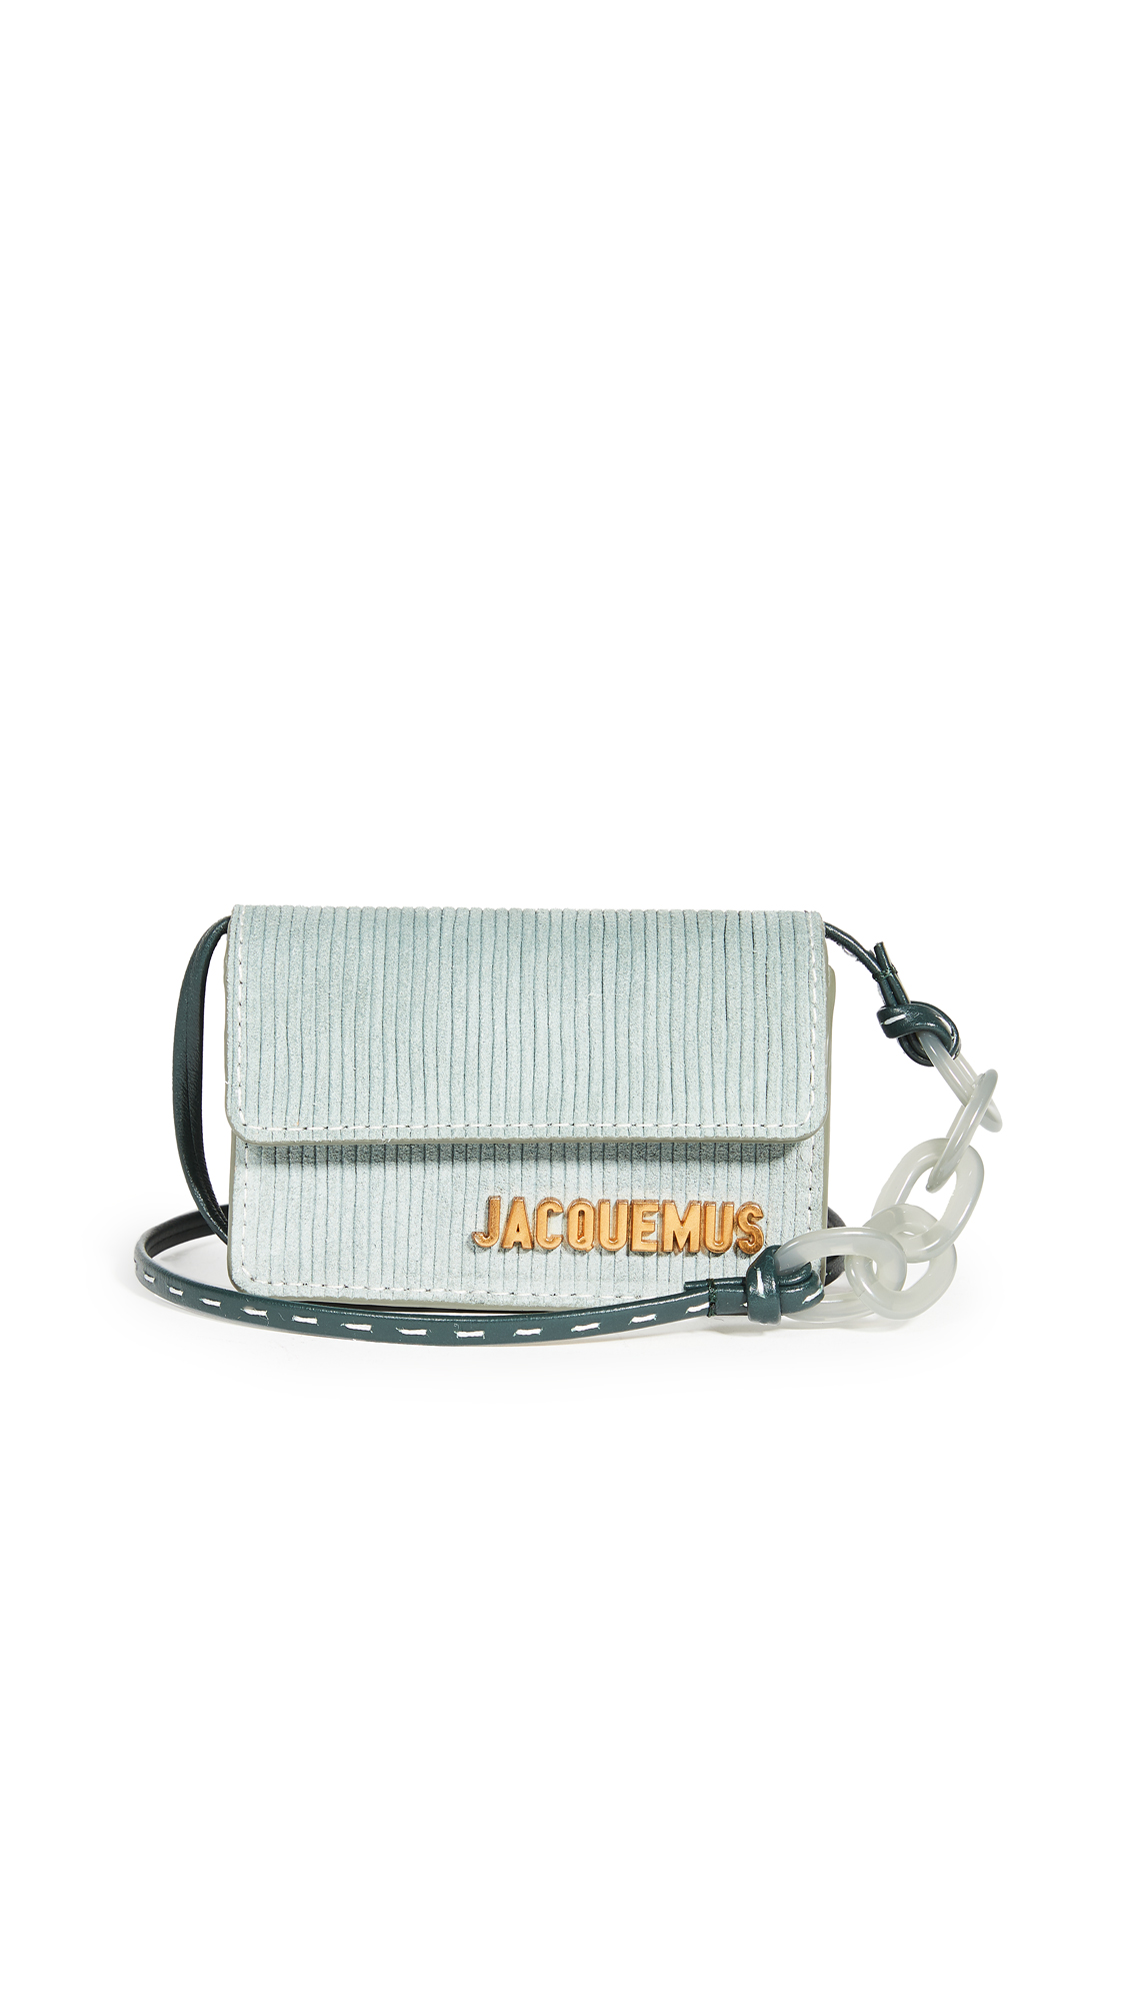 Jacquemus Le Petit Riviera Bag